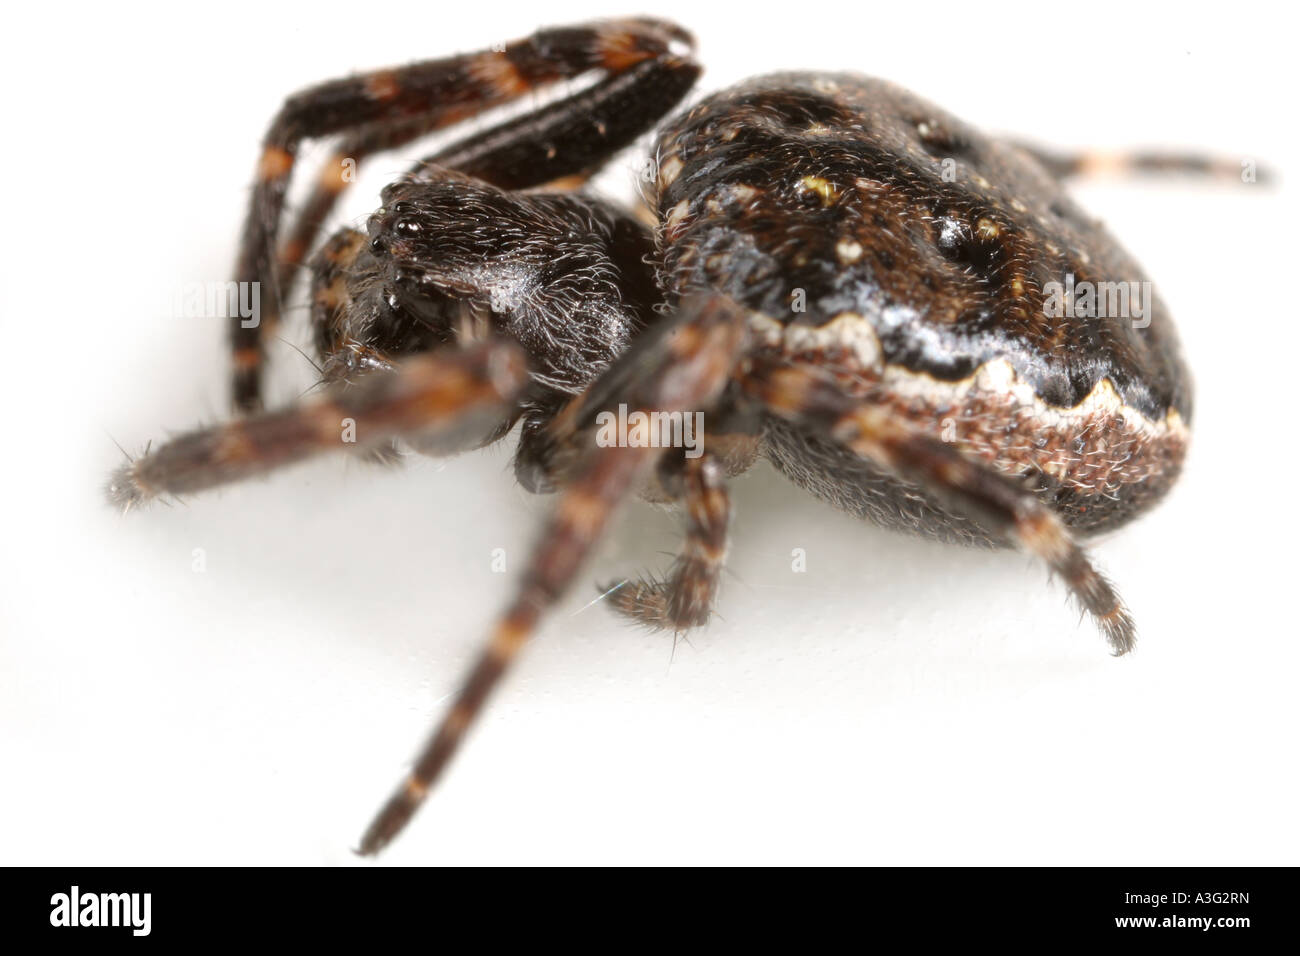 A Nuctenea umbratica spider, Araneidae family, on white background. Stock Photo